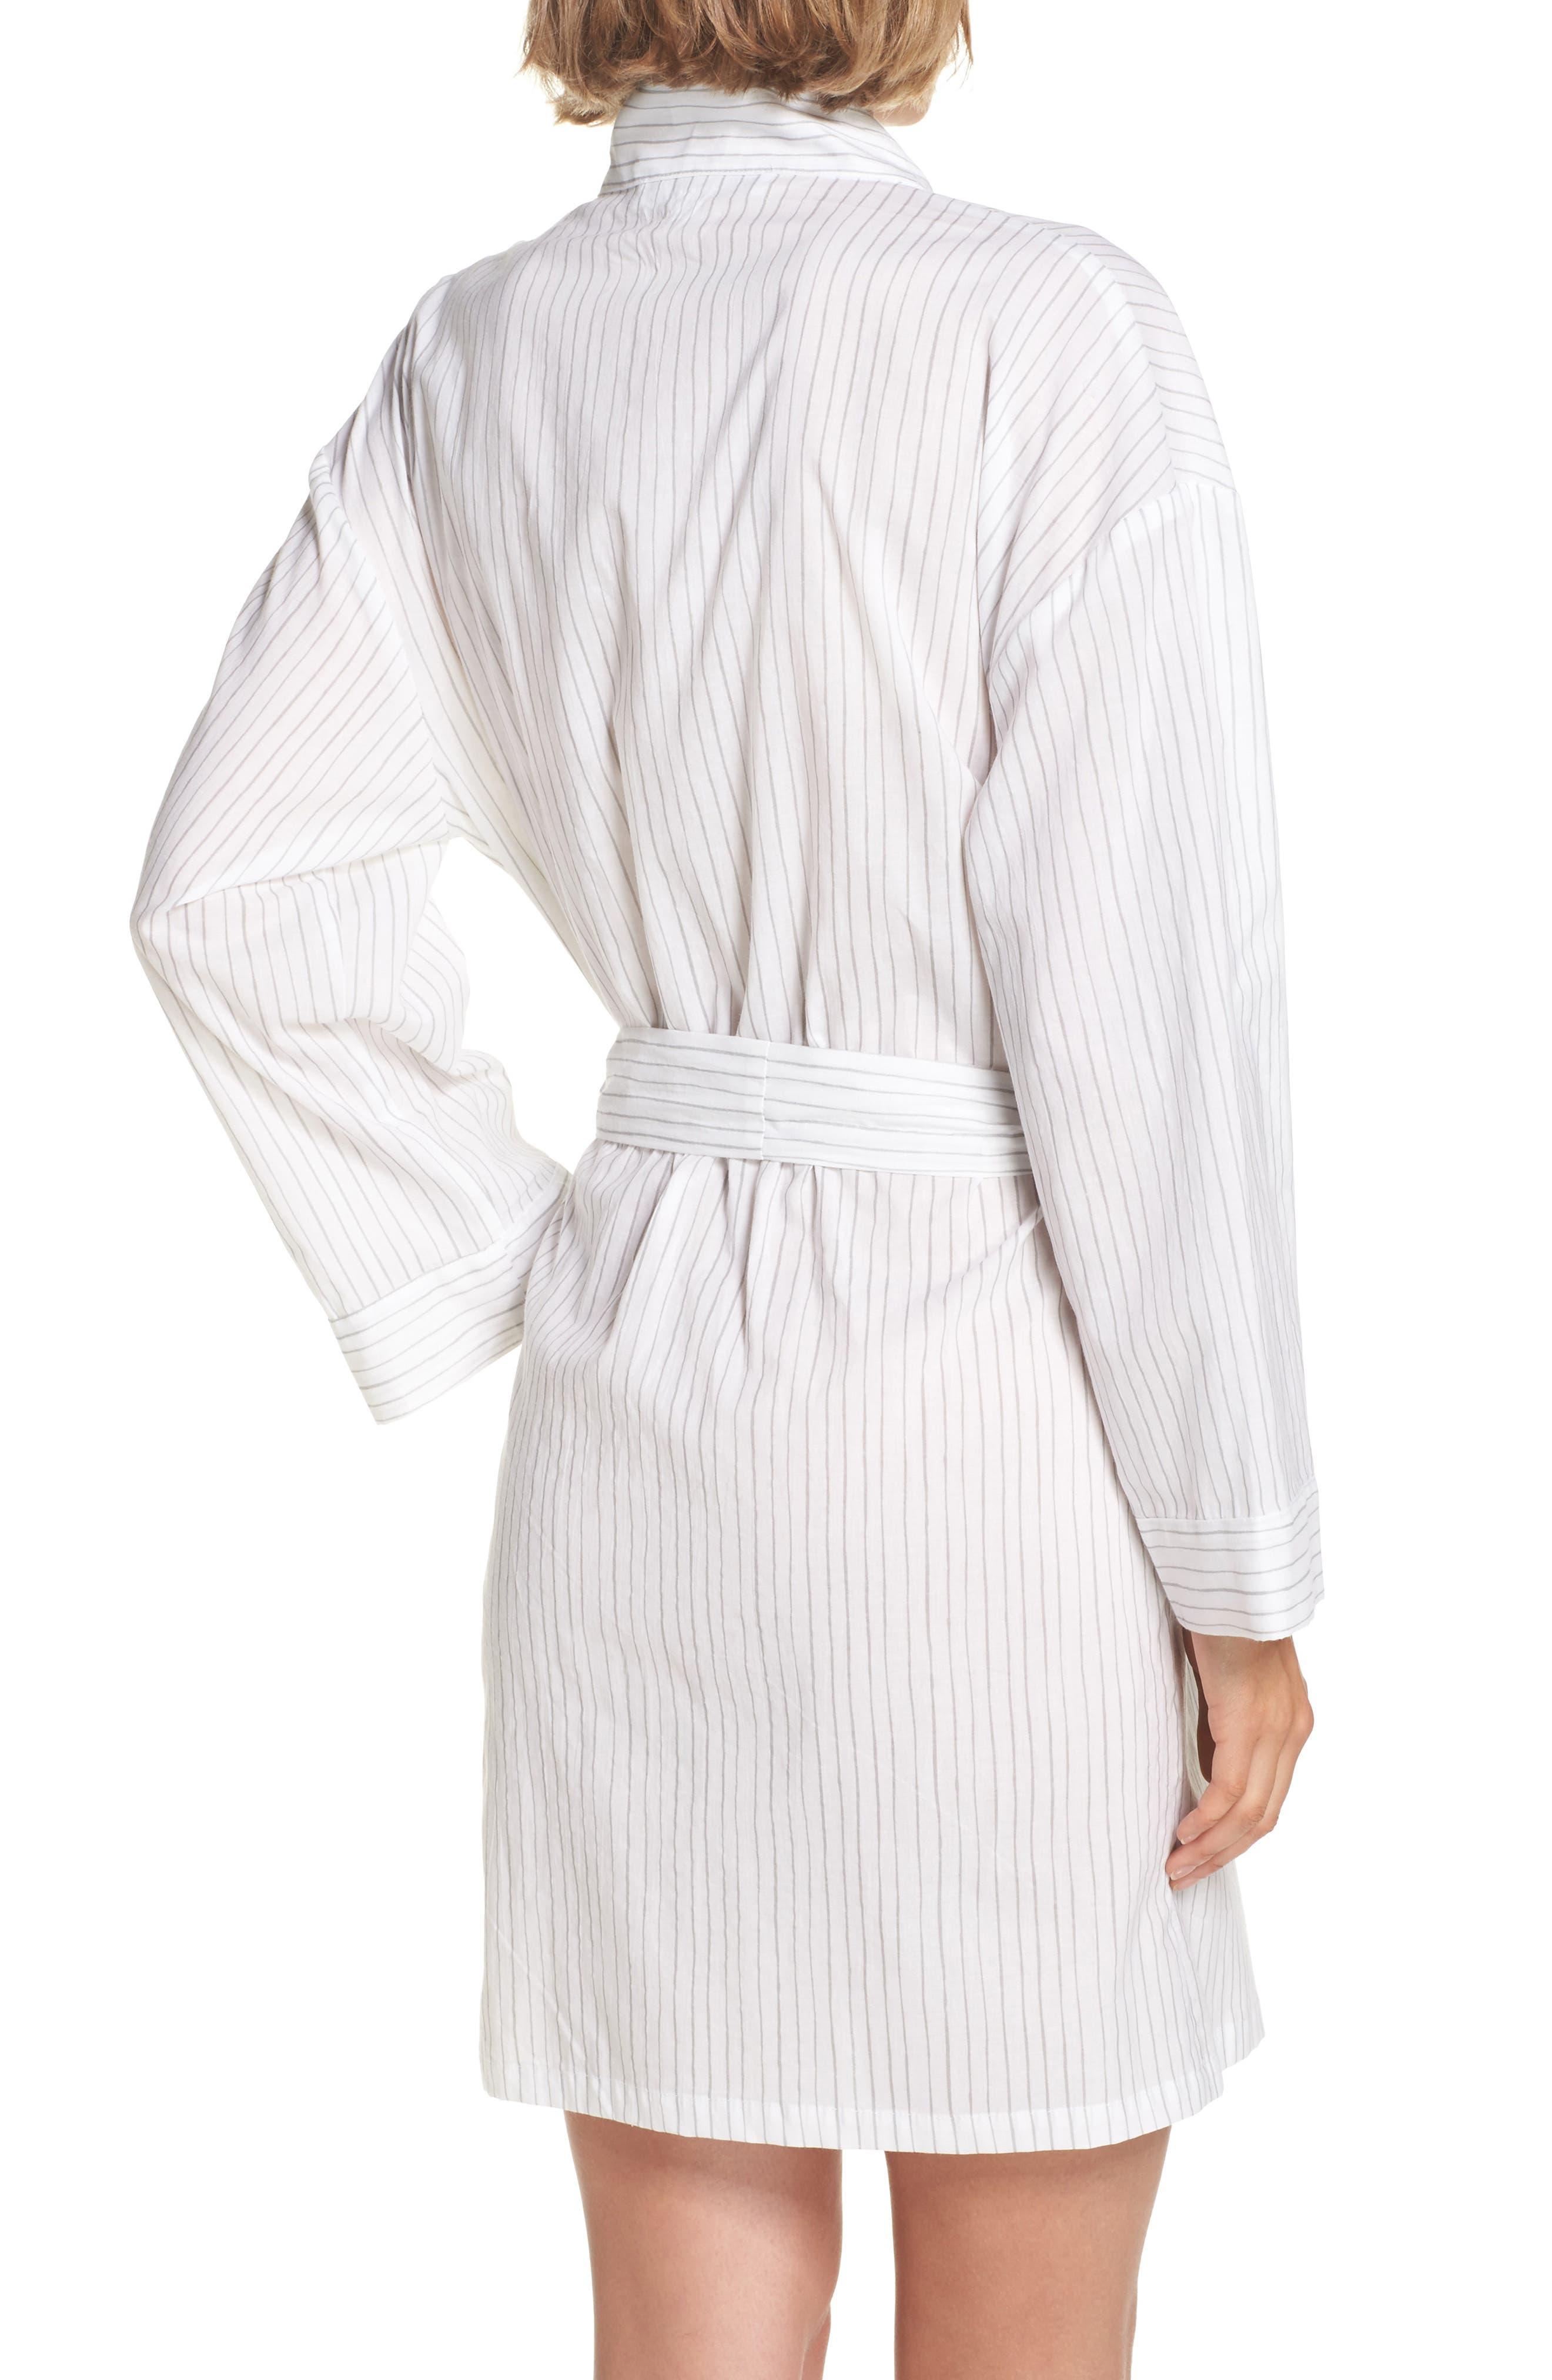 Pinstripe Robe,                             Alternate thumbnail 2, color,                             020